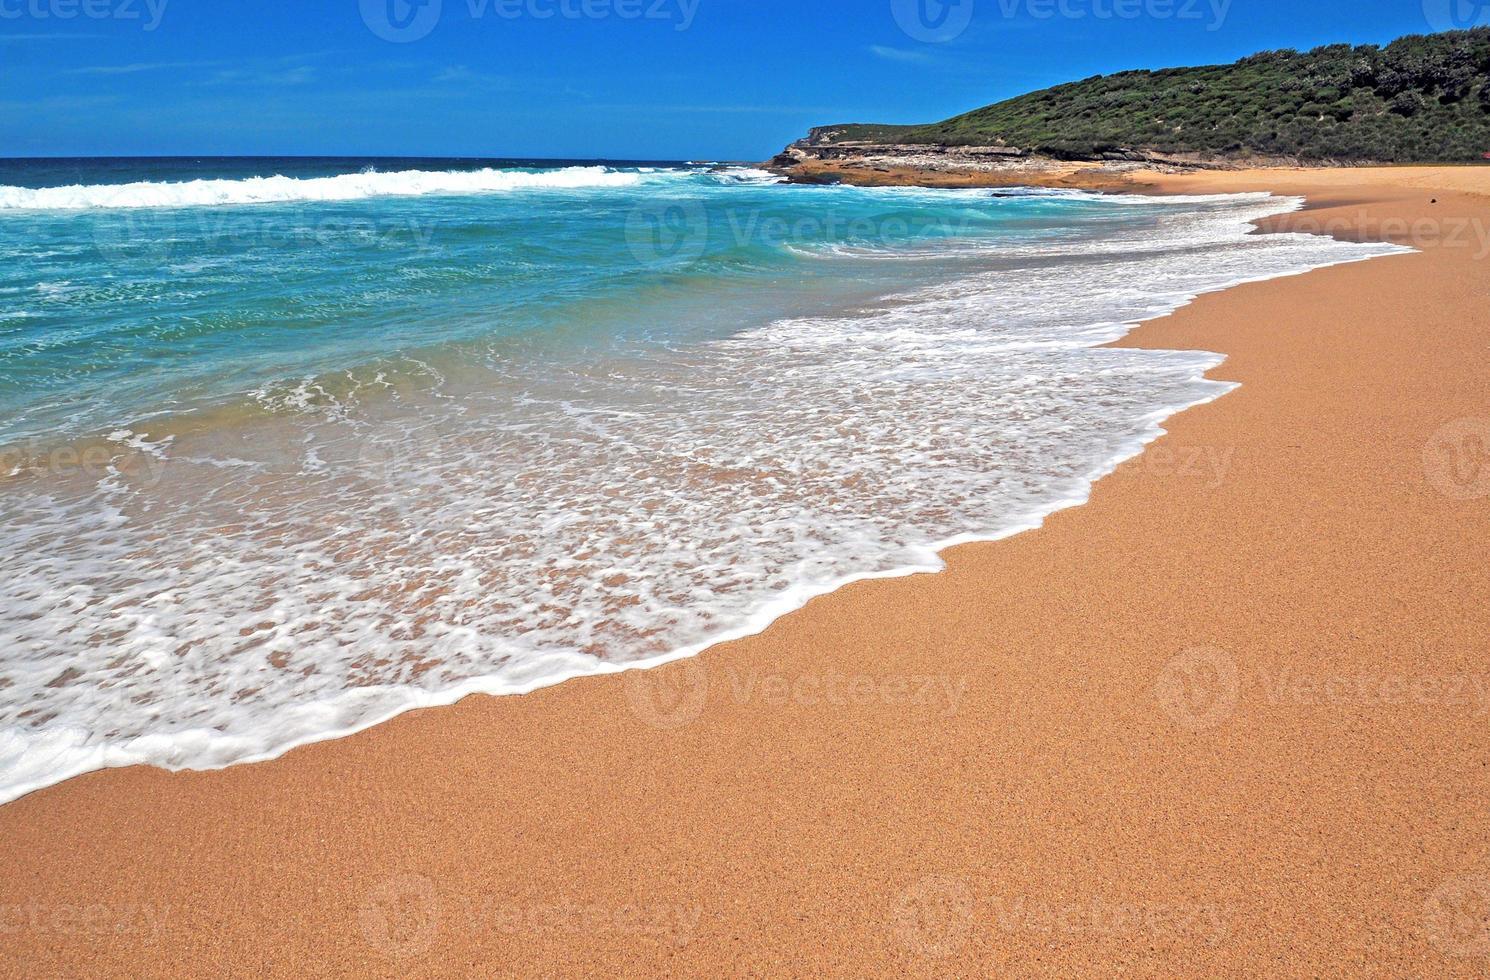 spiaggia incontaminata isolata vicino a Sydney, NSW Australia foto